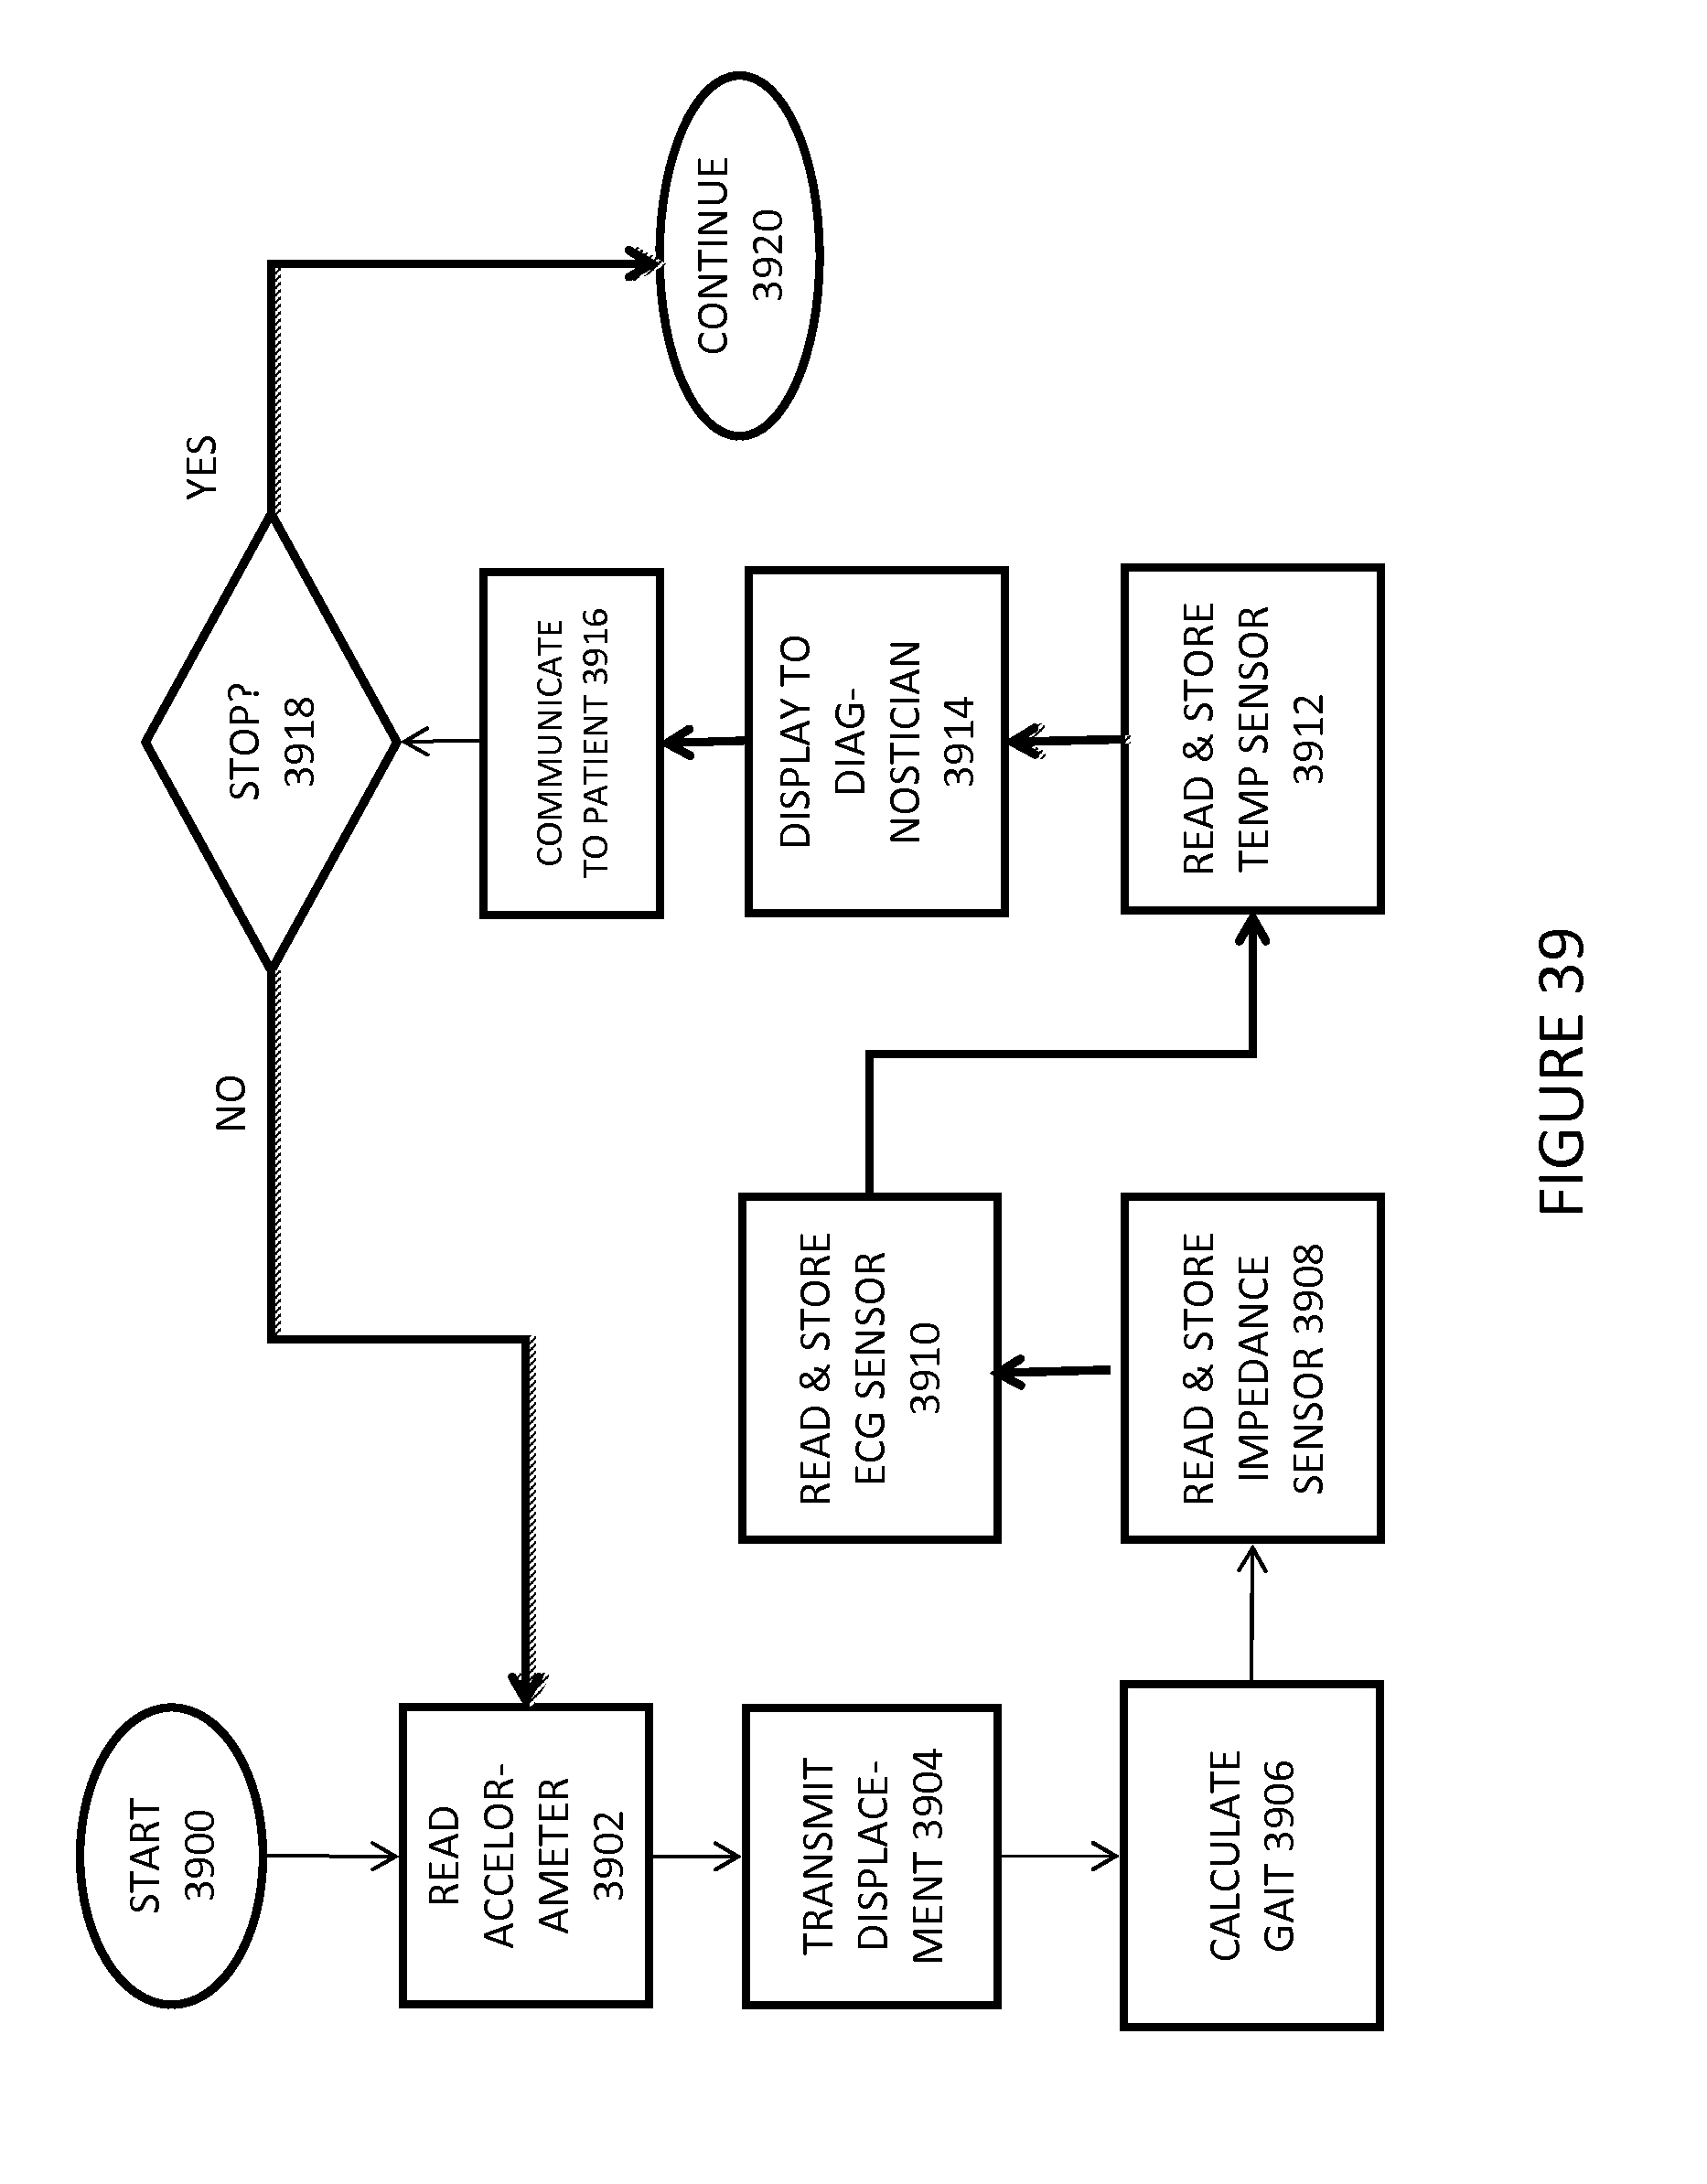 Patent Us 9883819 B2 Techno 4 Circuit Diagram 0 Petitions